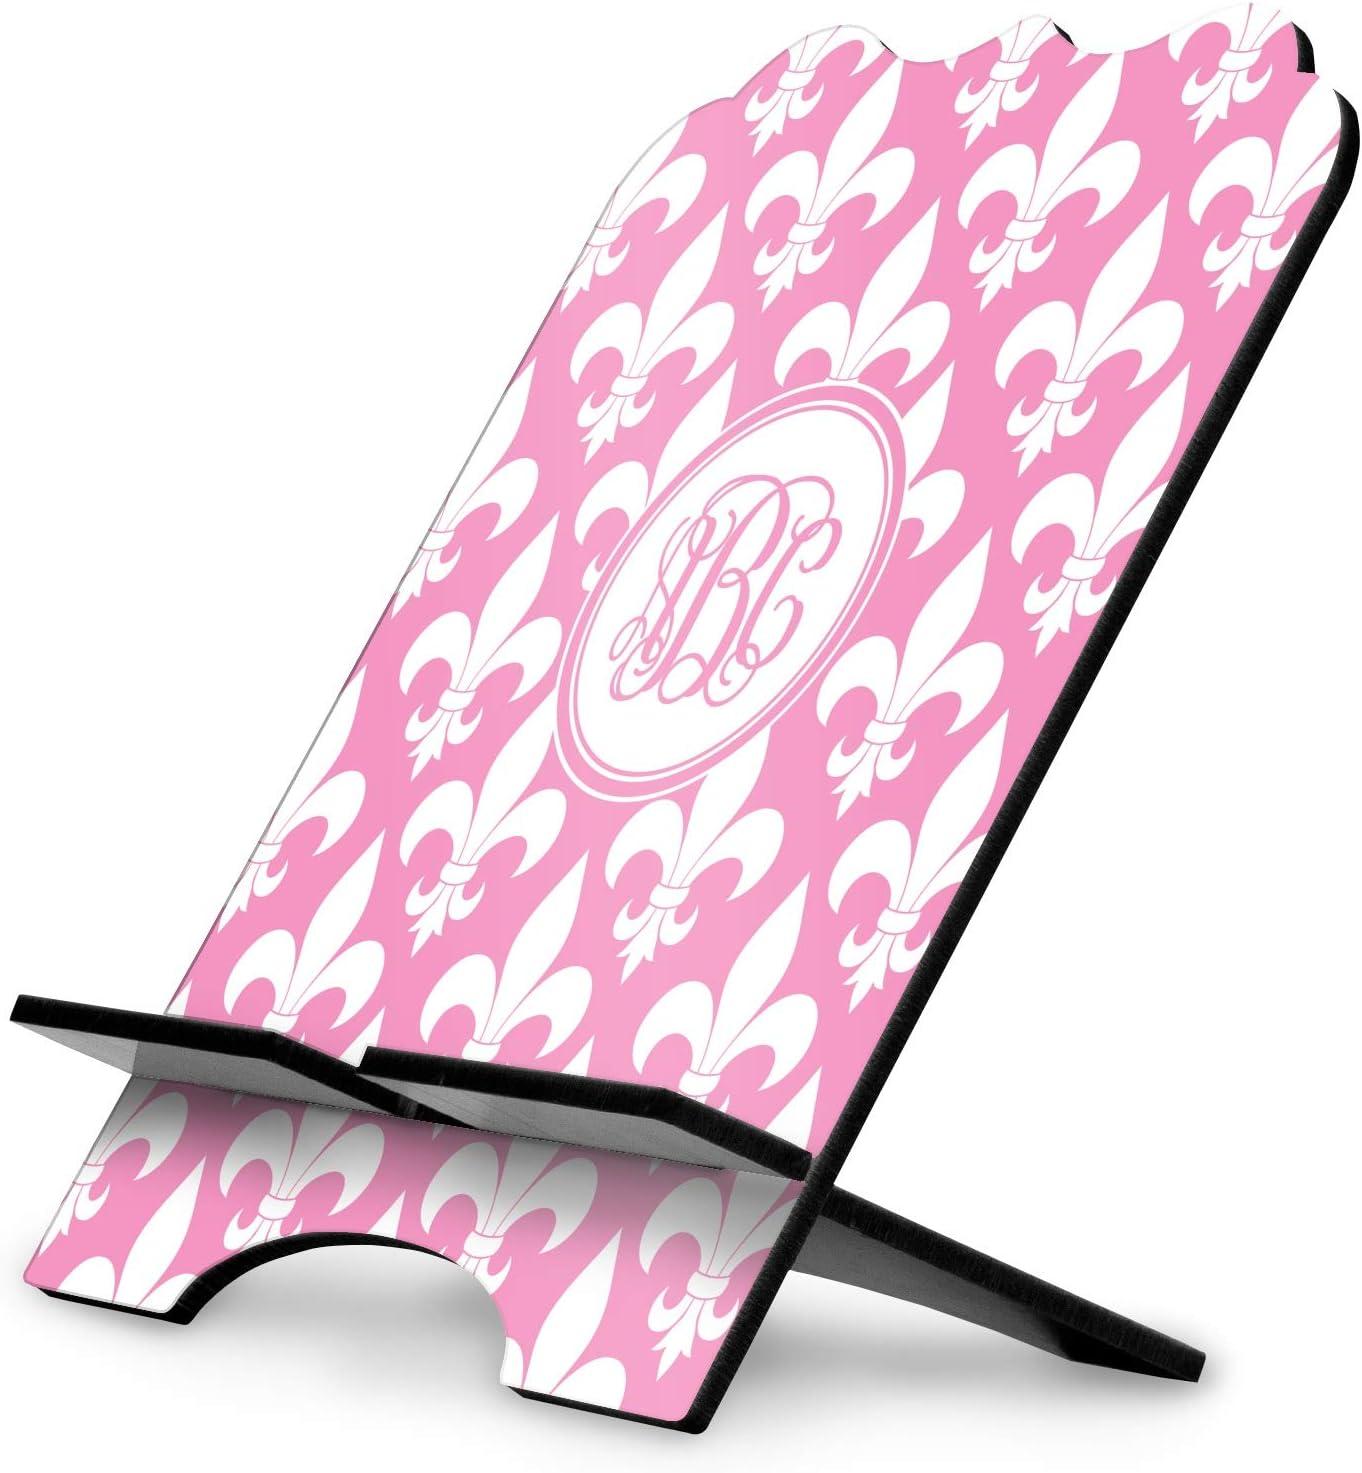 YouCustomizeIt Fleur De Lis Stylized Tablet Stand Personalized